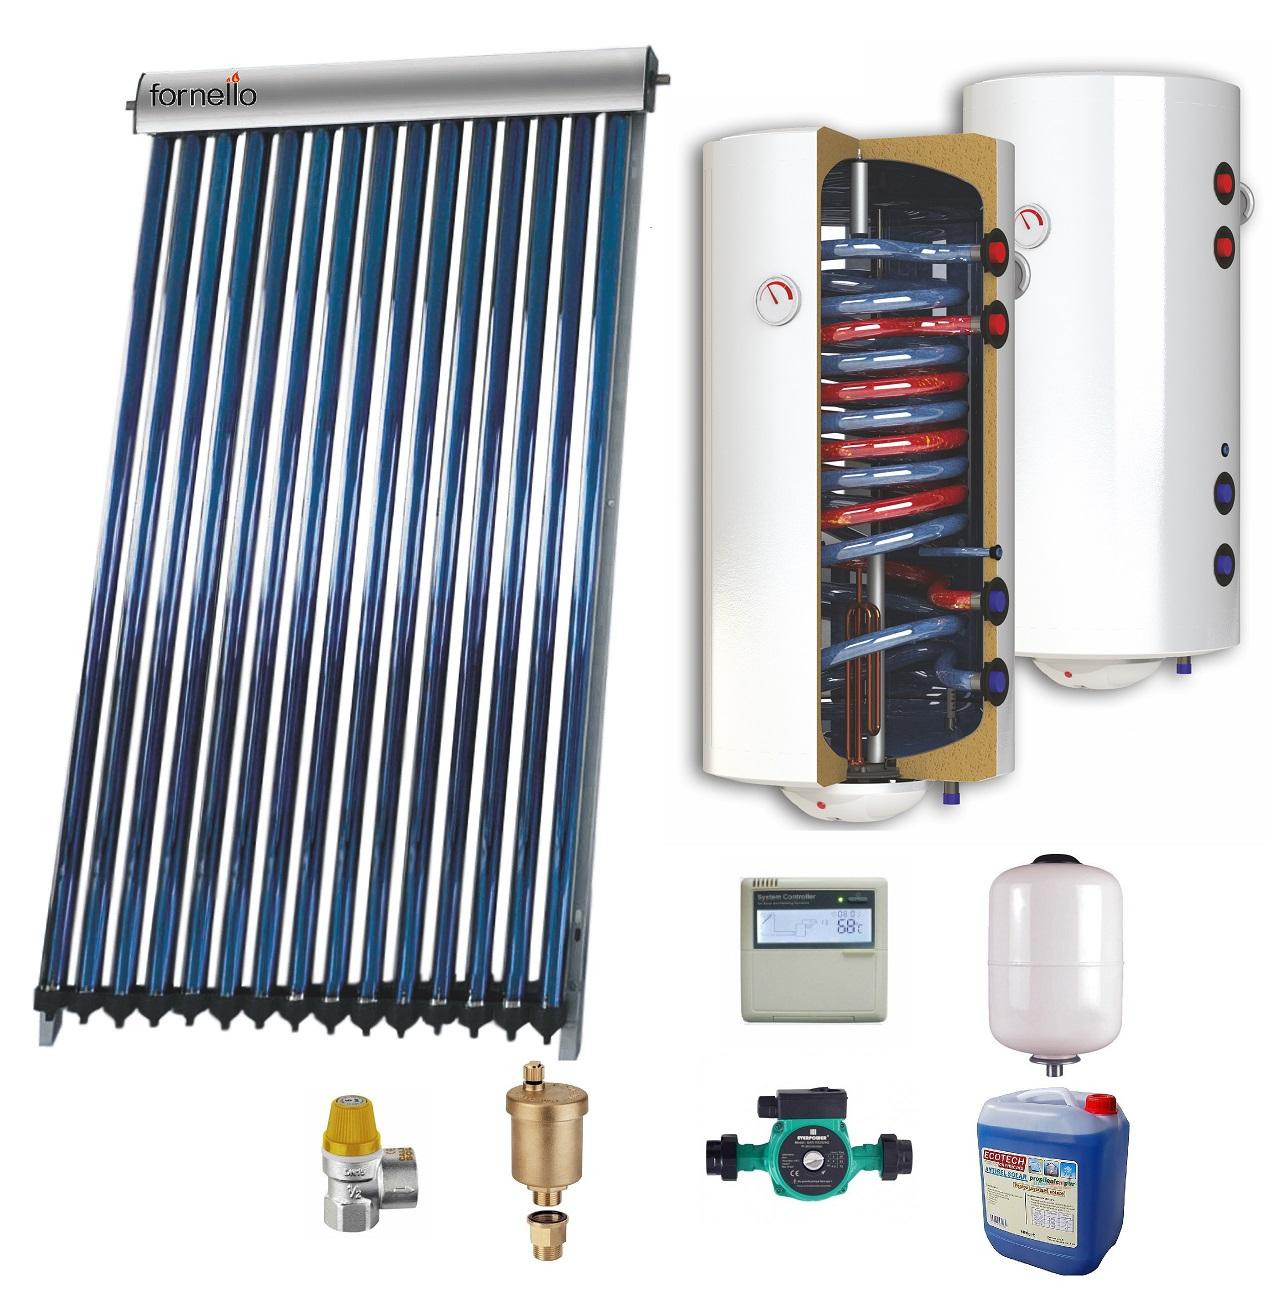 Sistem solar presurizat , panou Sunsystem VTC 20, boiler cu 2 serpentine si rezistenta electrica Sunsystem 200 litri, pompa 25-60, controller, vas expansiune, antigel, supapa 1/2, aerisitor 1/2 fornello imagine